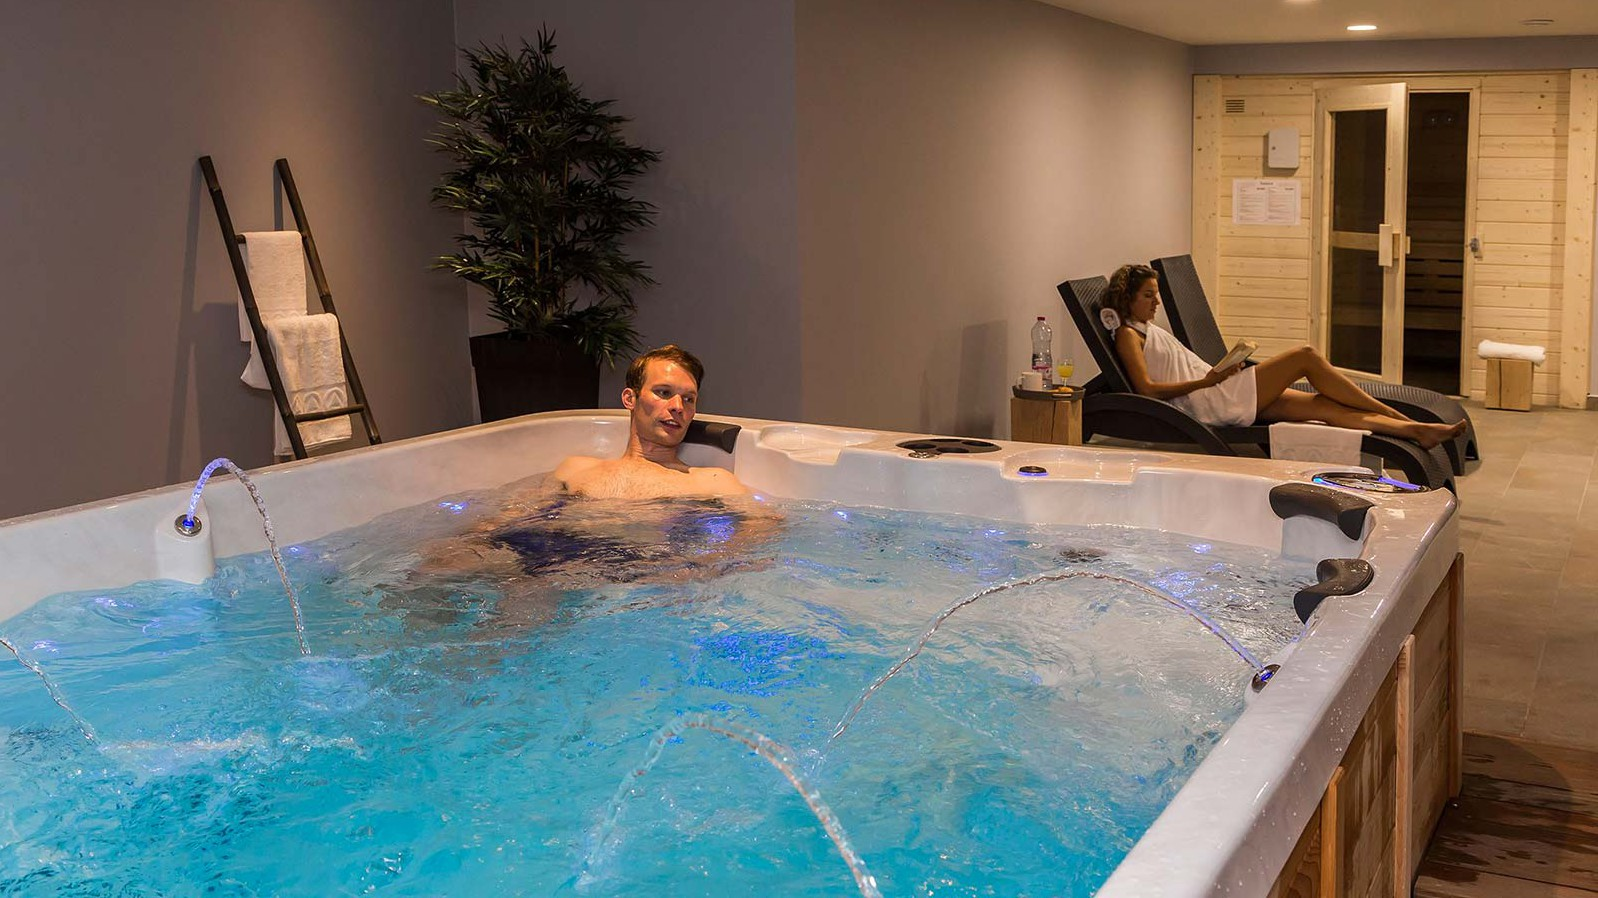 Residence Isatis - Self-catered apartment-chamonix-residence - wellness facilities